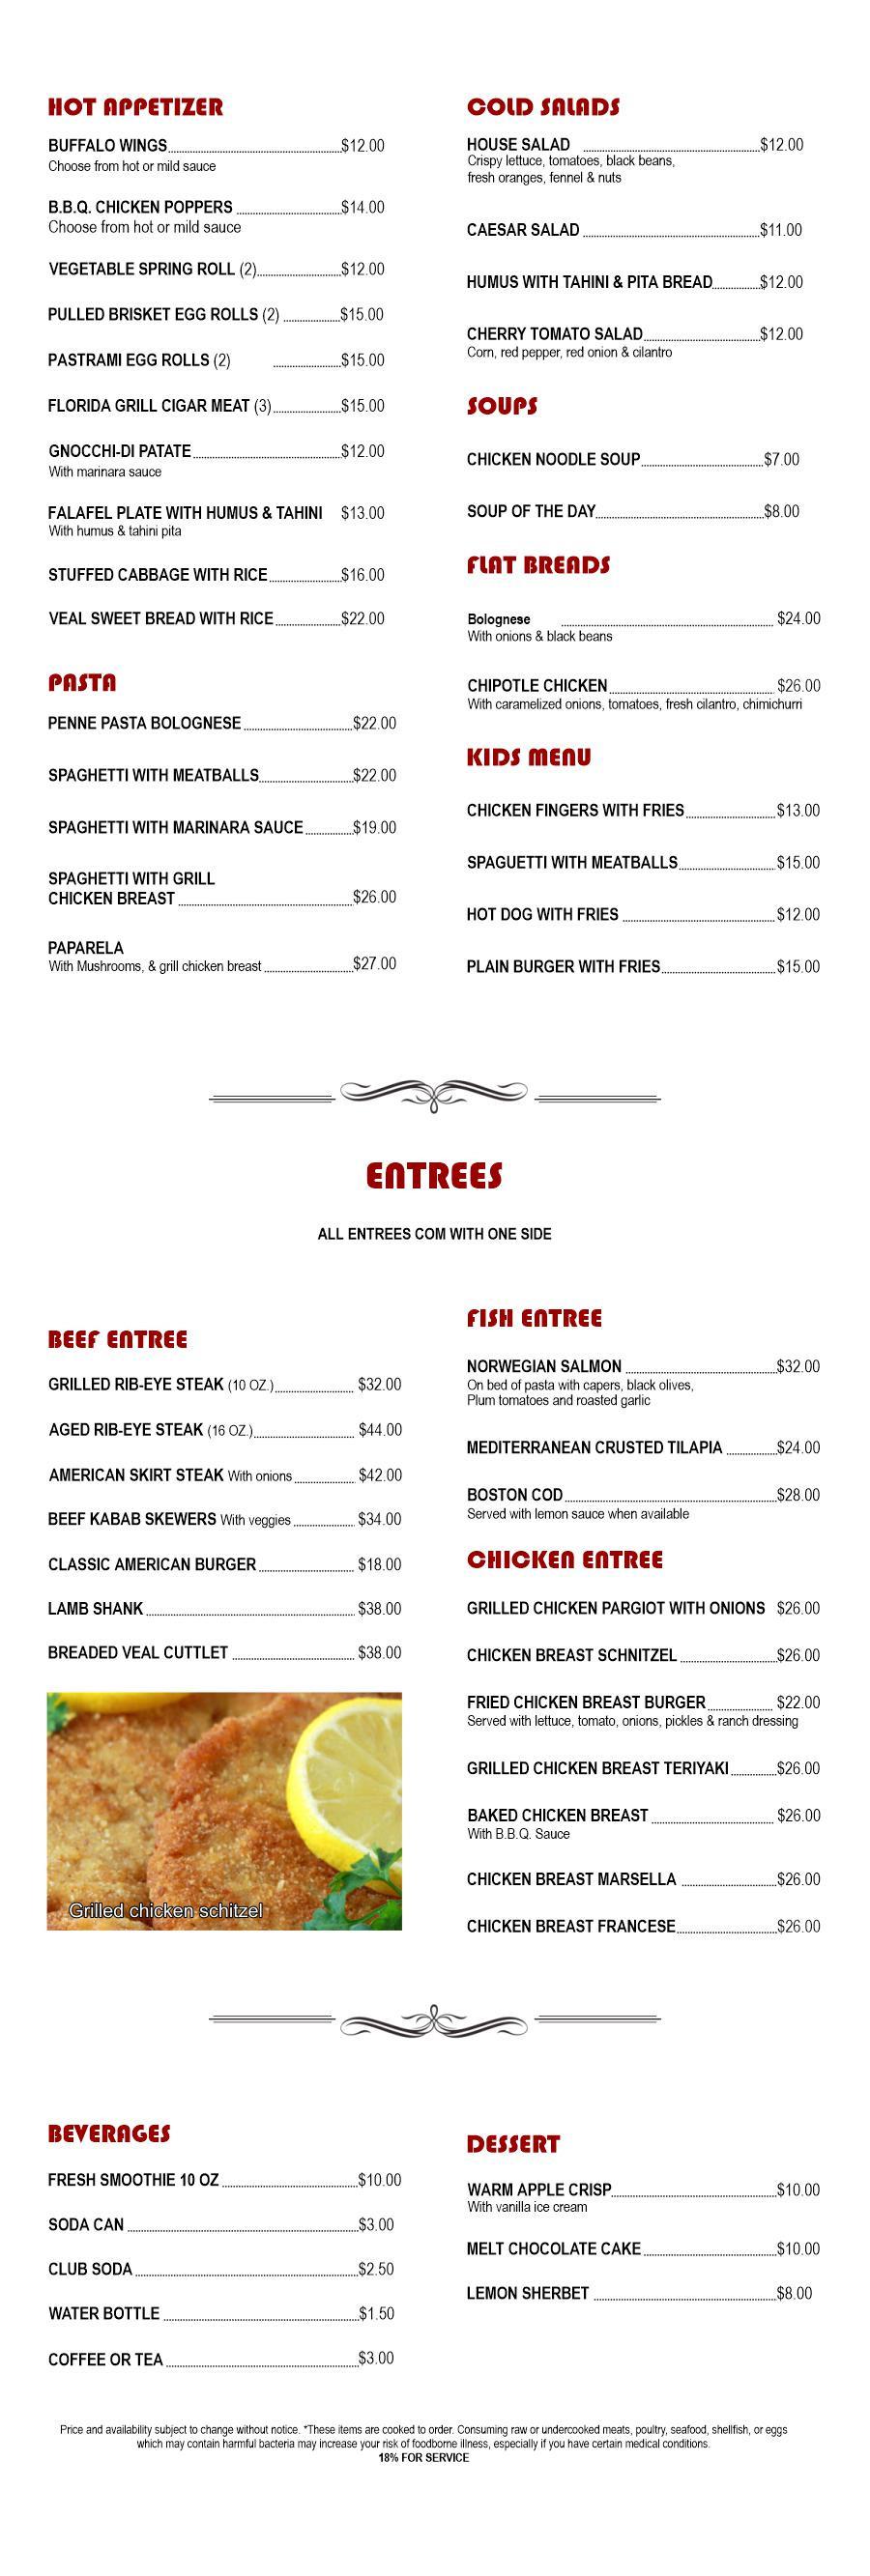 florida grill menu 2020.jpg